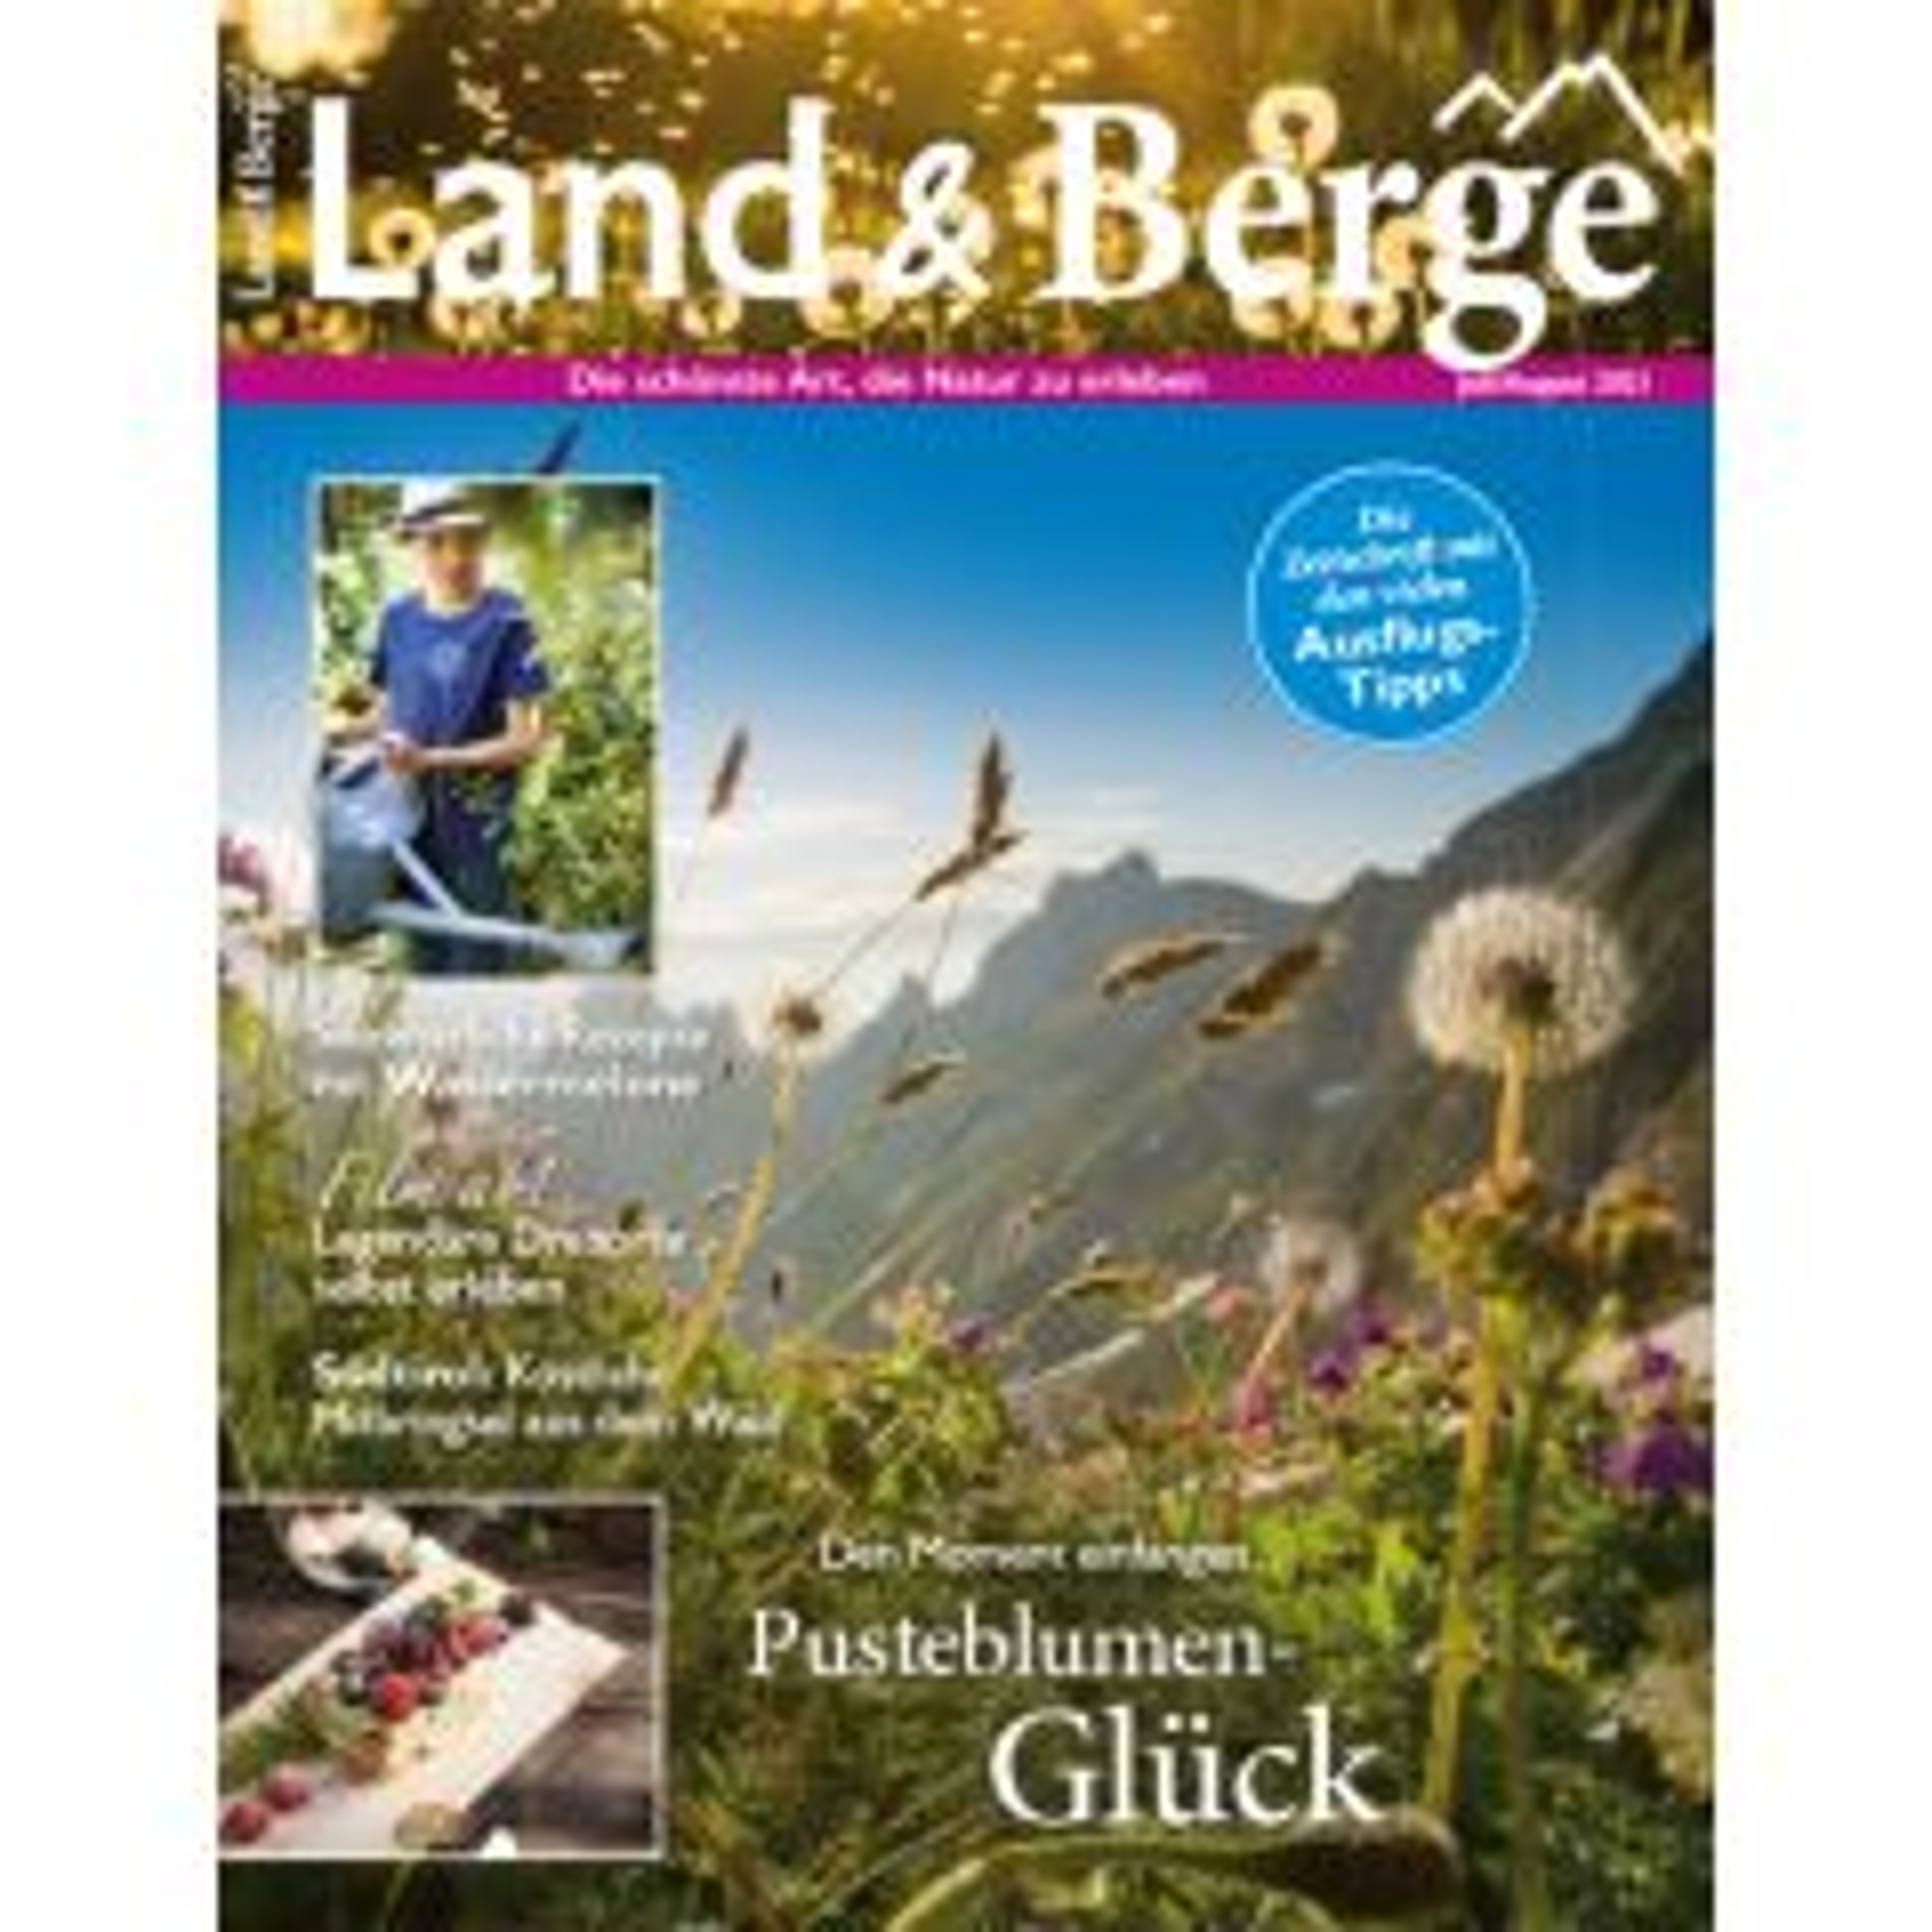 Land & Berge 4/2021